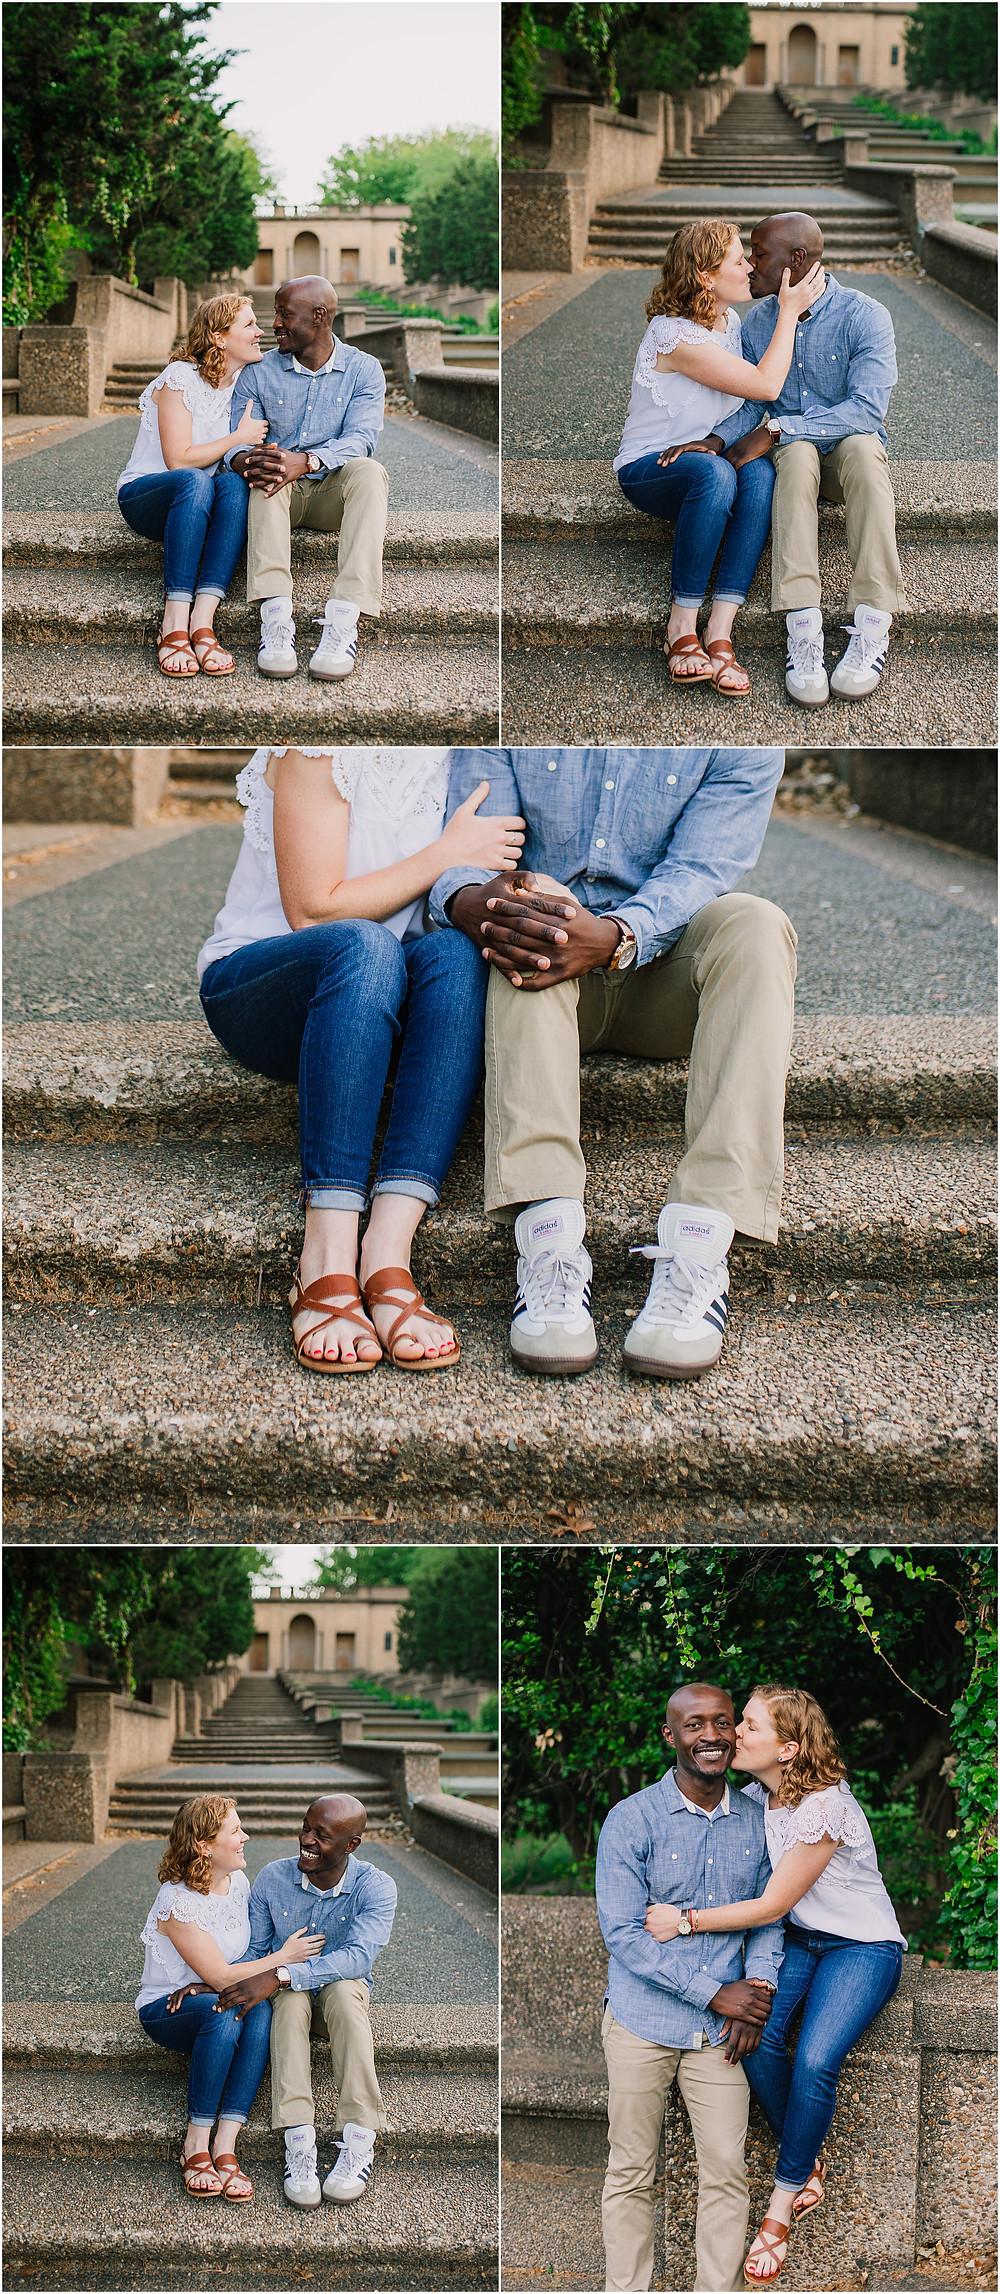 Engagement Portraits at Meridian Hill Park. Washington DC Wedding Photographer